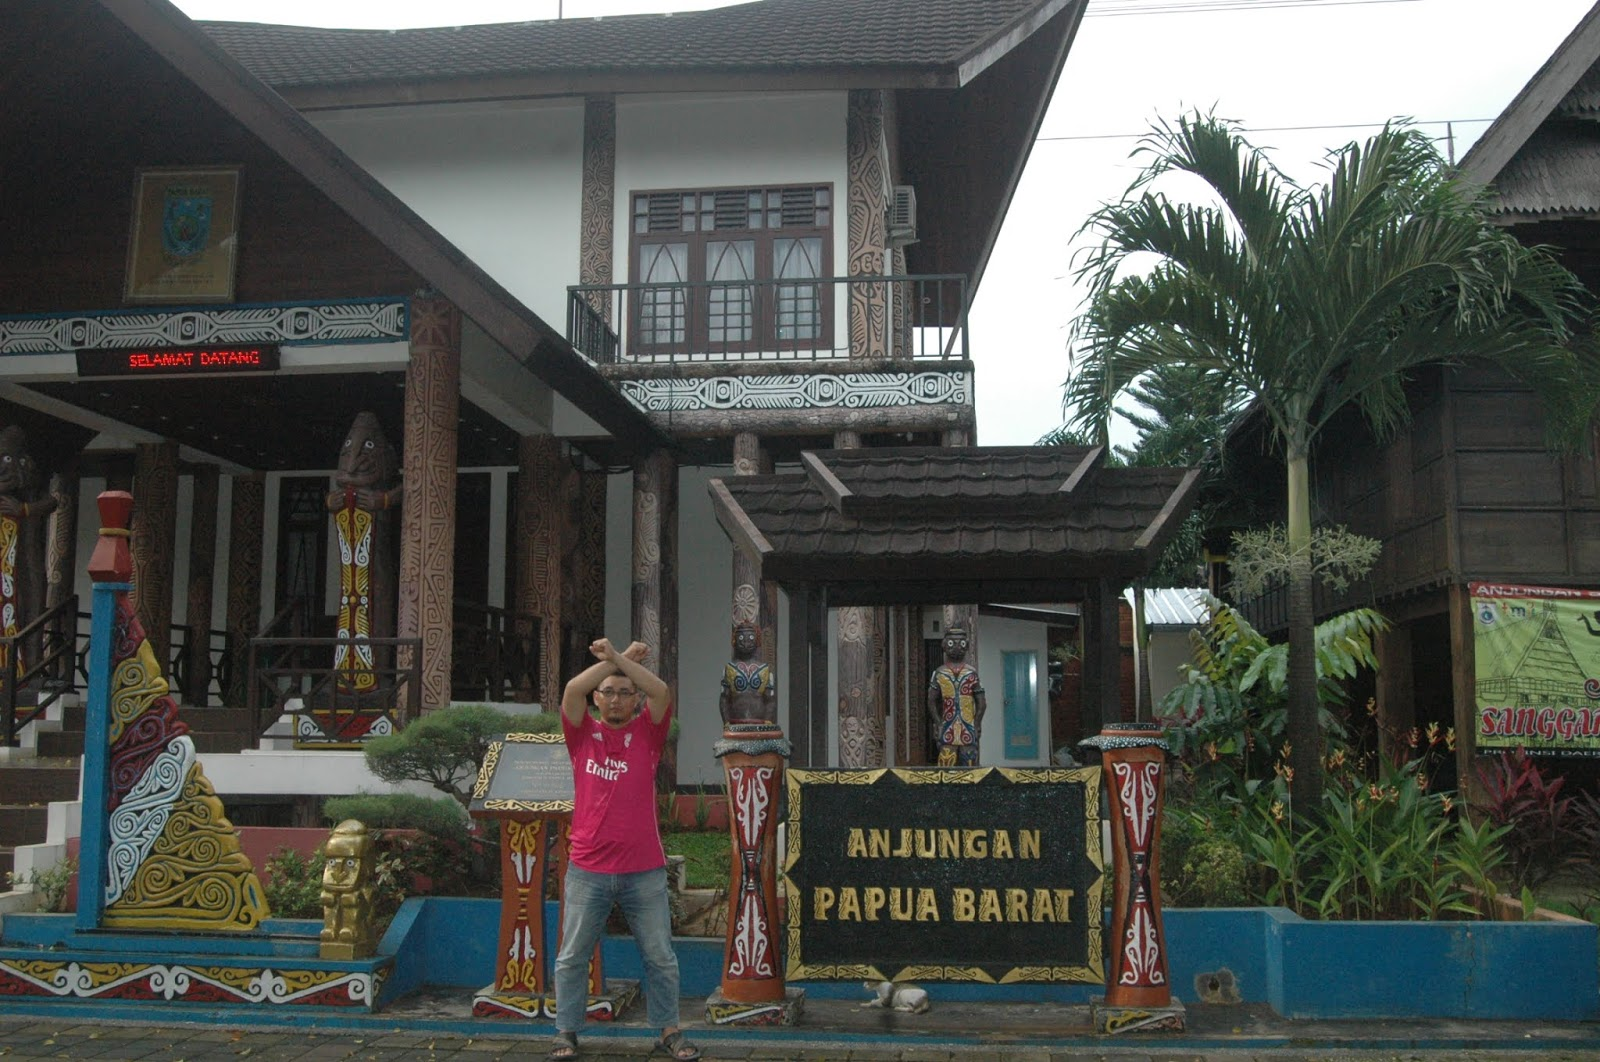 tiket pesawat jakarta surabaya, taman mini indonesia indah, jakarta, traveling, papua barat